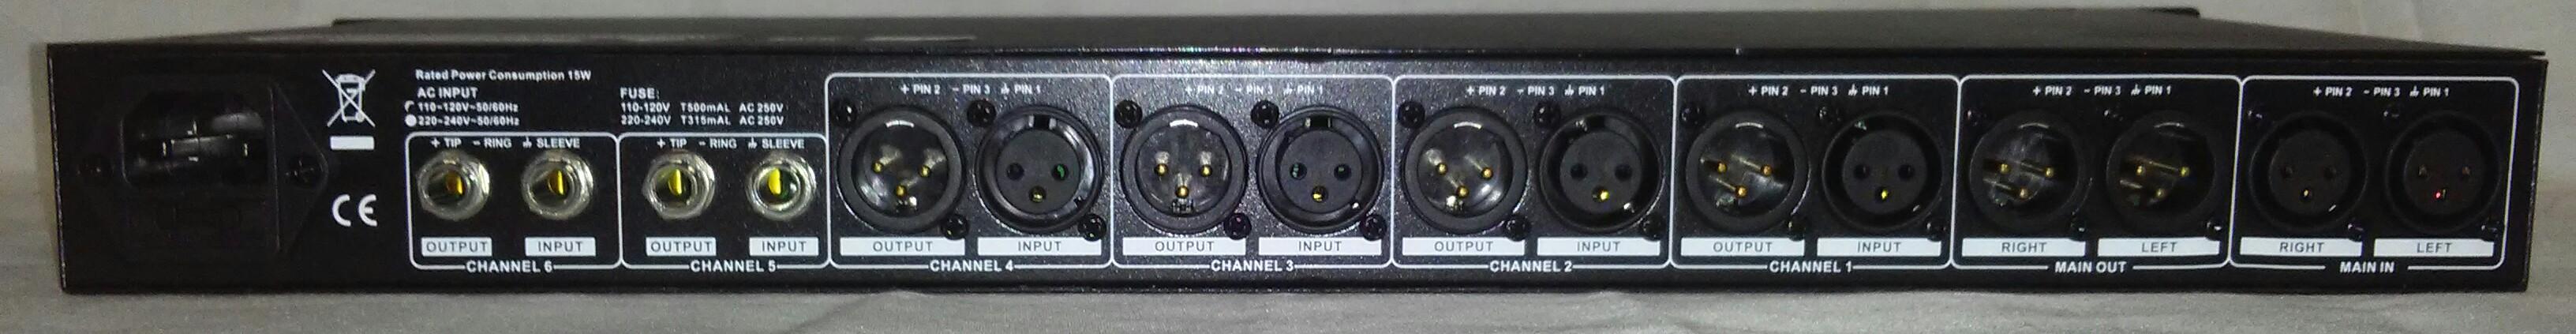 MXS86   6 Channel Mixer / Splitter